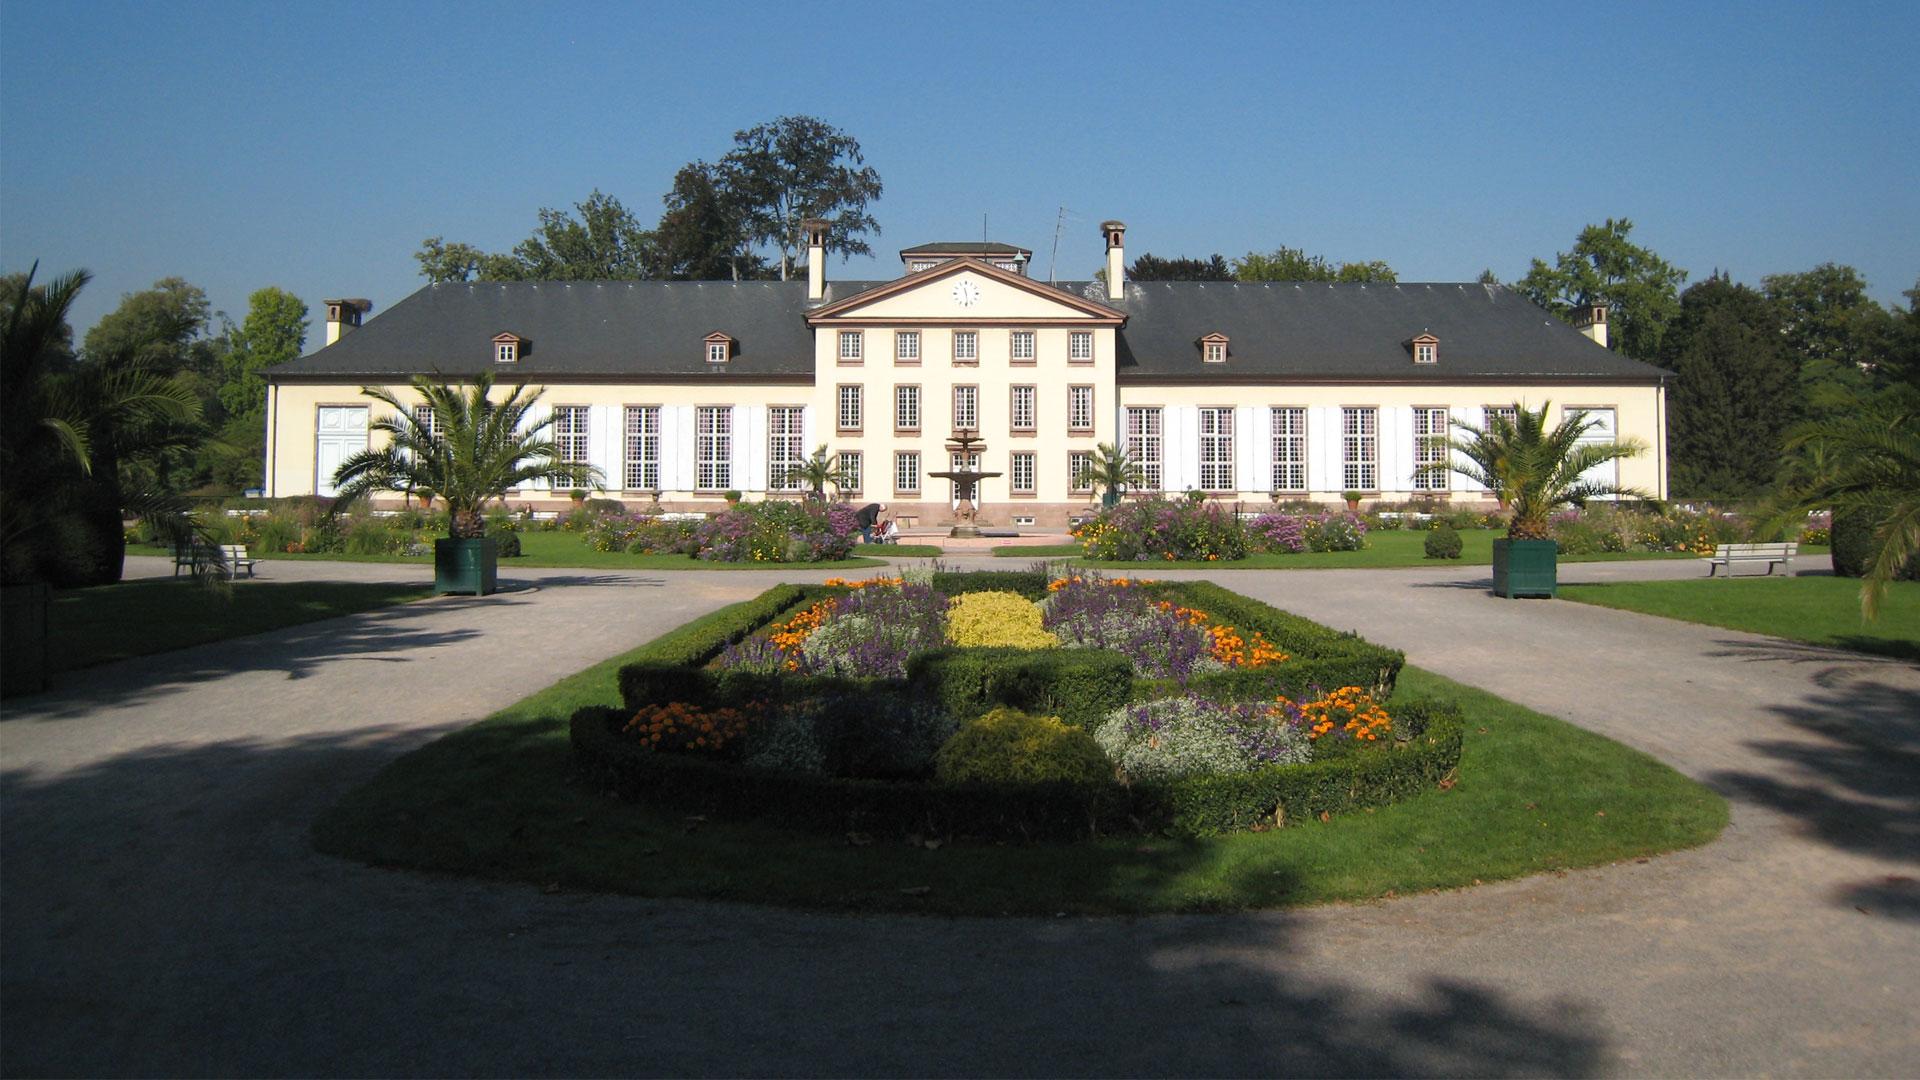 Pavillon Joséphine à Strasbourg - photo PSA